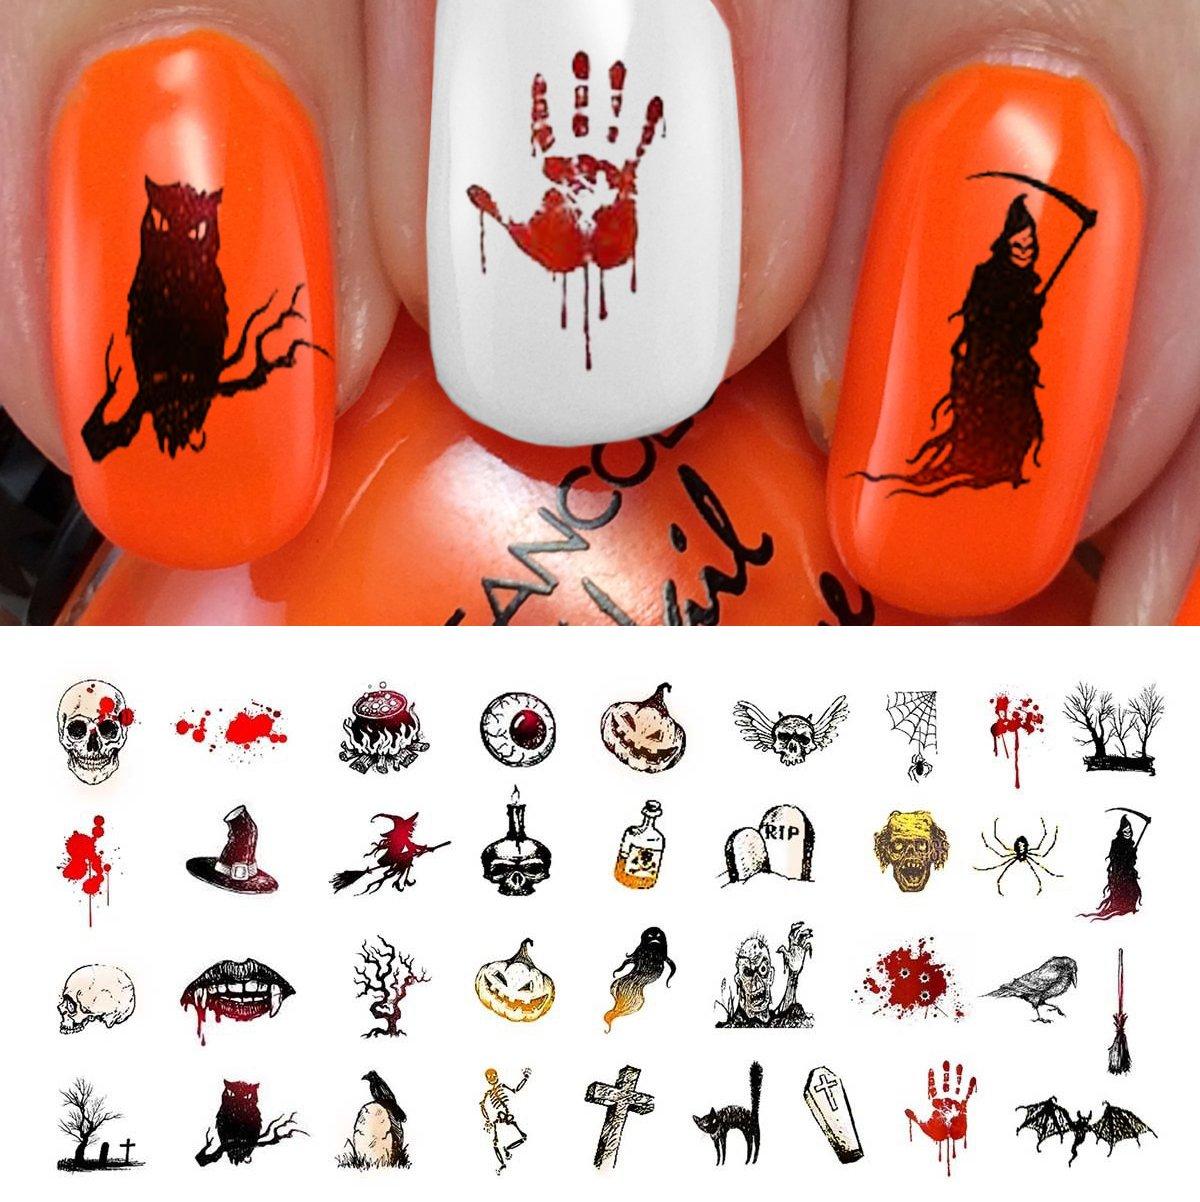 Amazon.com: Halloween Nail Decals Assortment #4 - WaterSlide Nail Art Decals  - Salon Quality!: Beauty